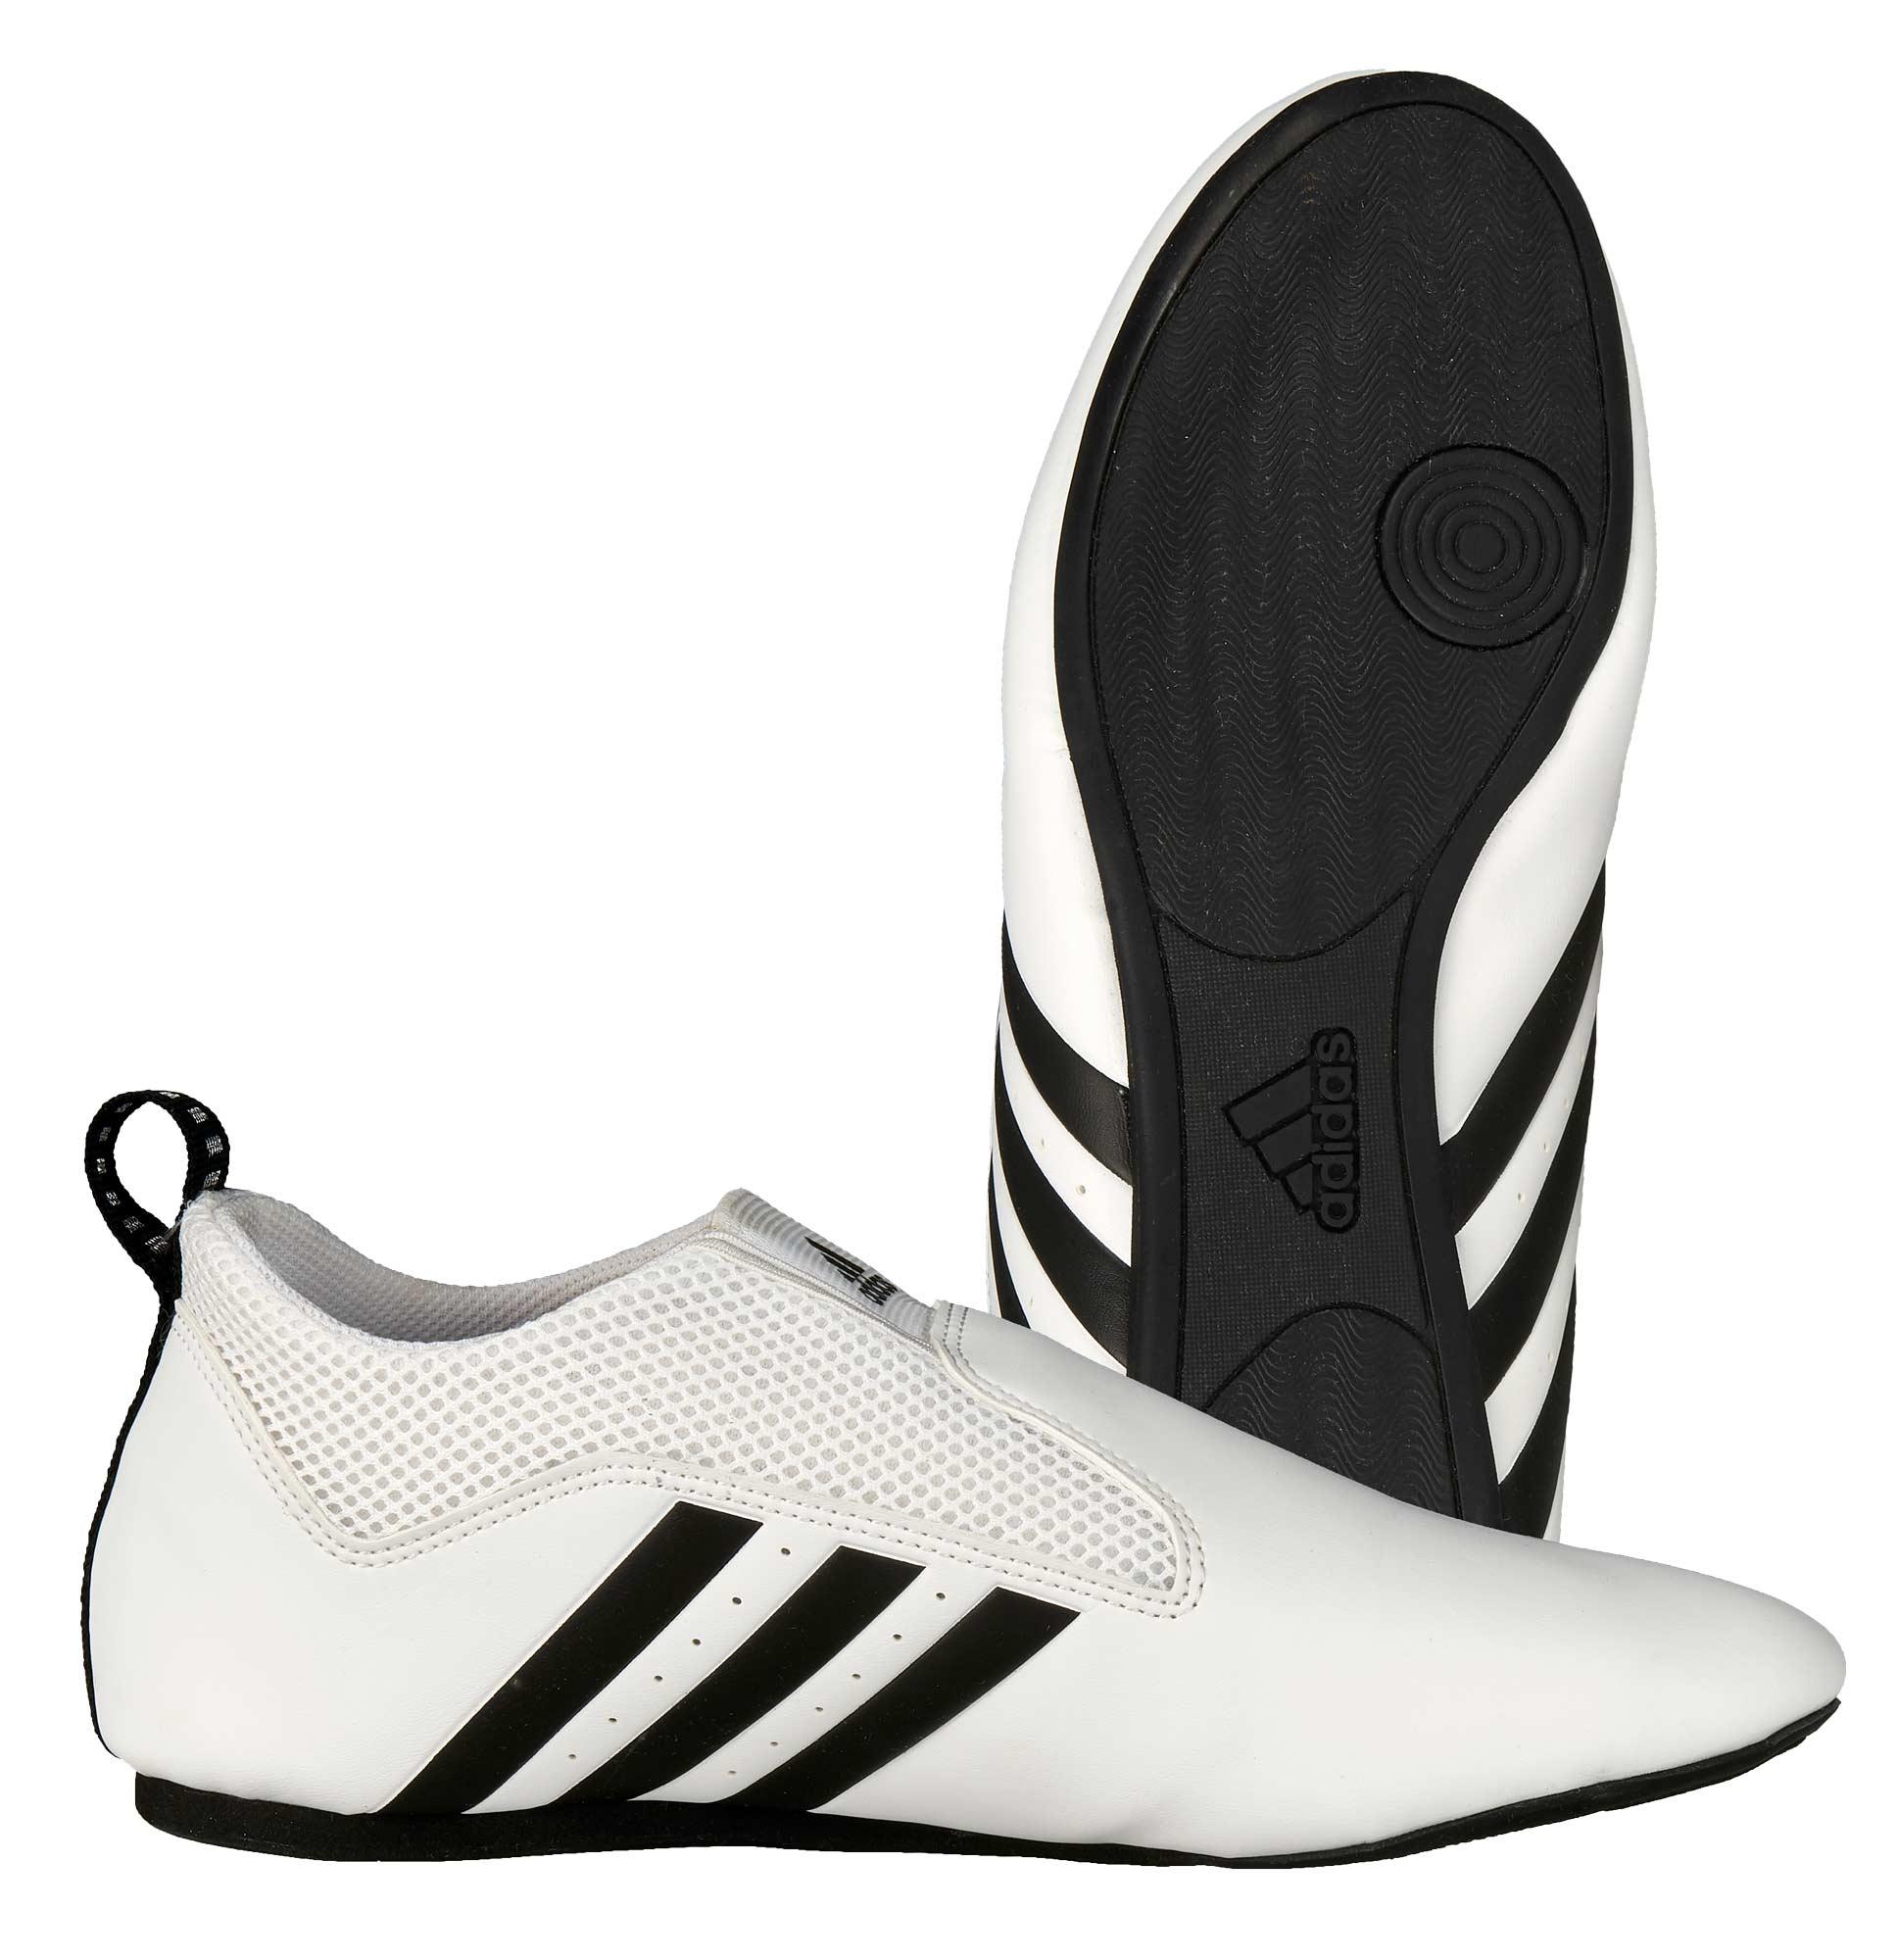 Chaussure de Taekwondo Adidas Contestant pro